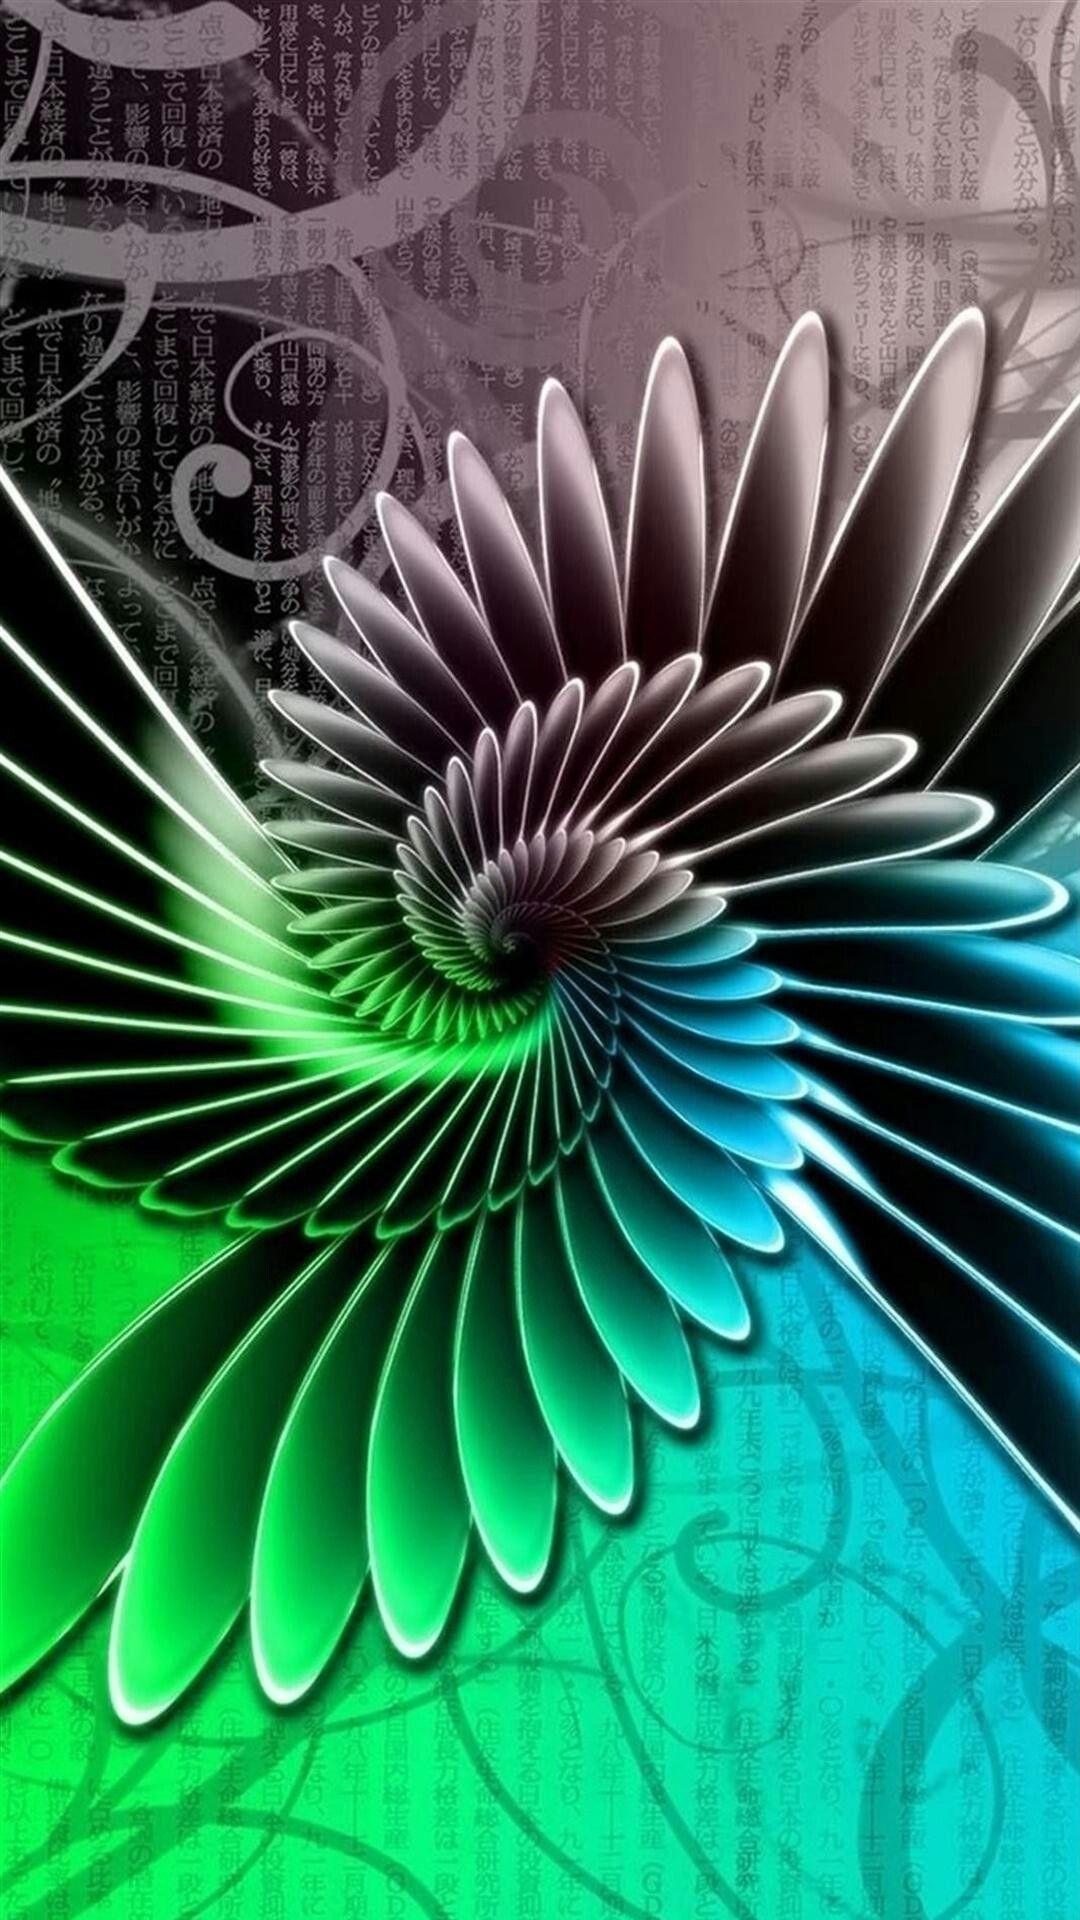 Spiral blue, green, gray wallpaper for LG